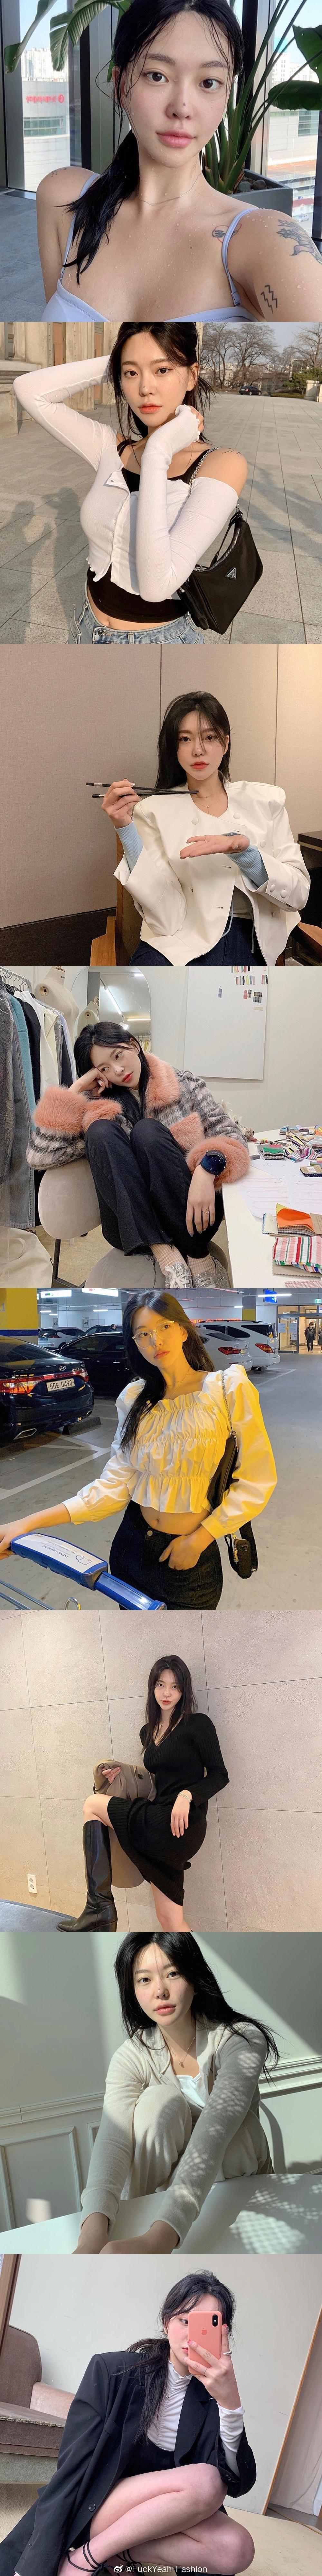 Bemyoung - 韩国博主日常私服合集~☁️